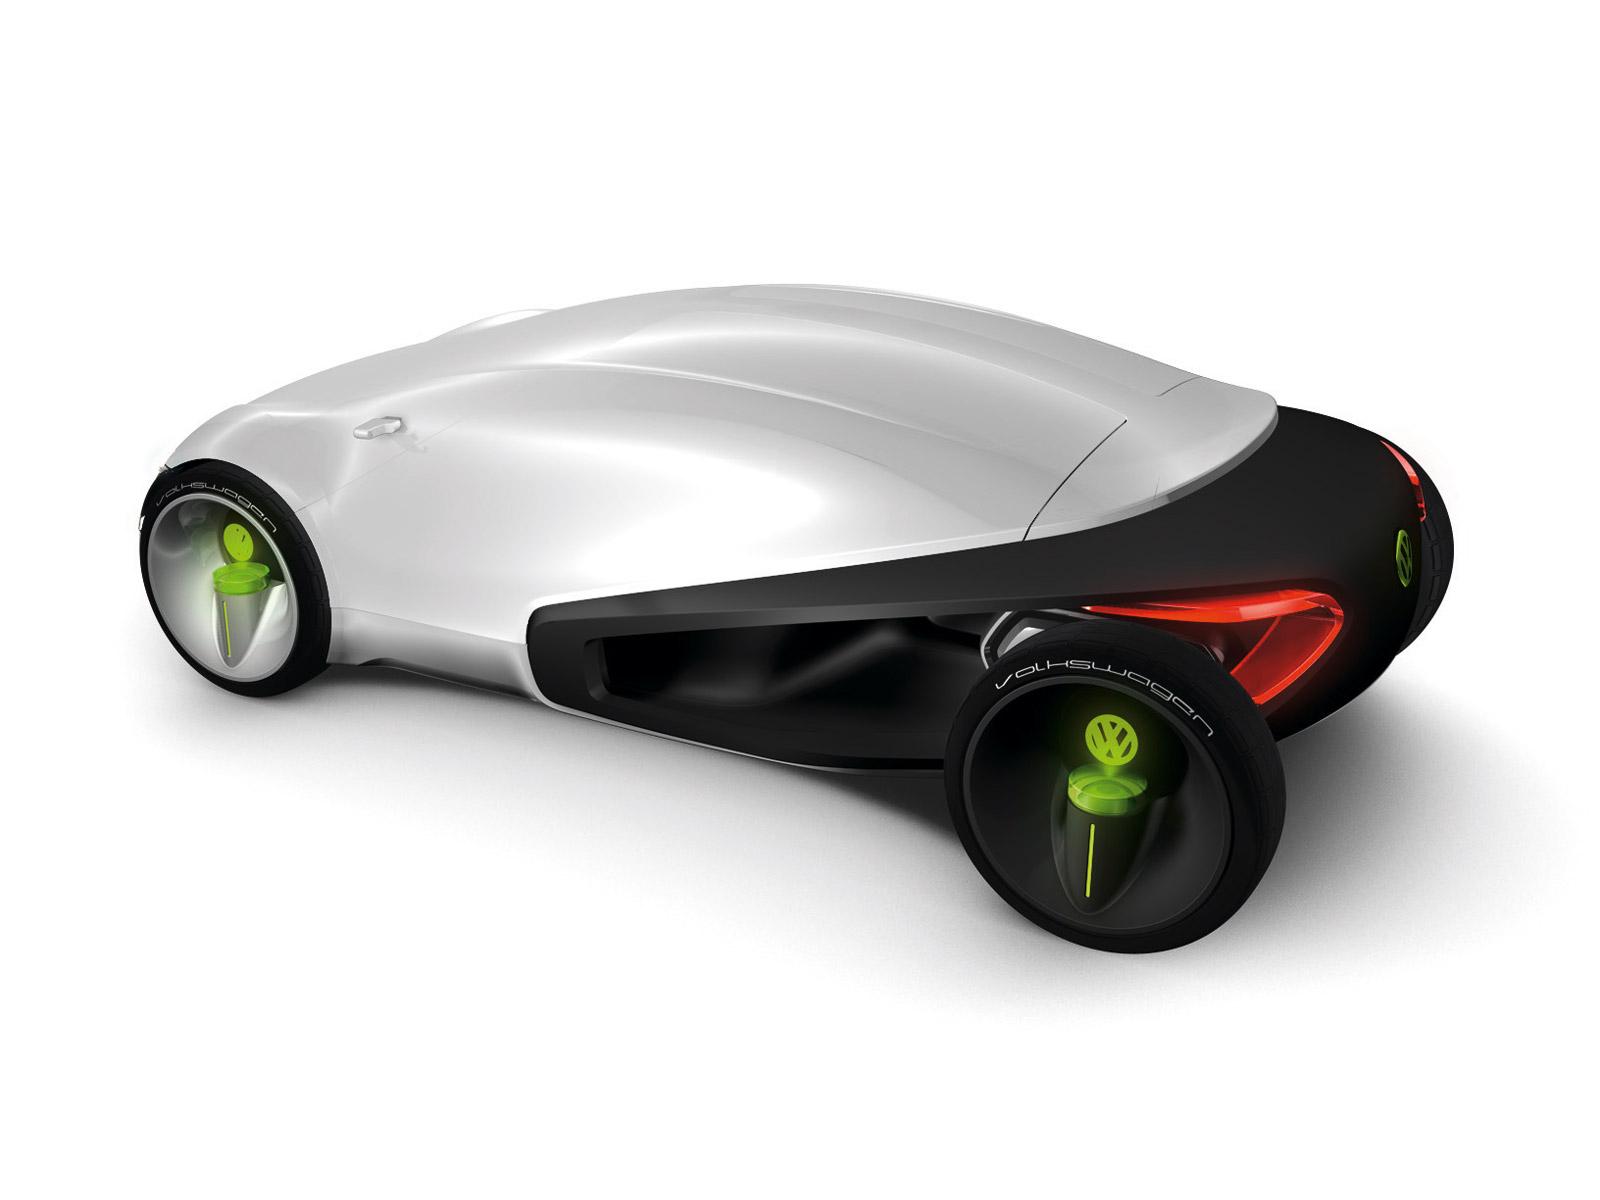 Volkswagen del futuro